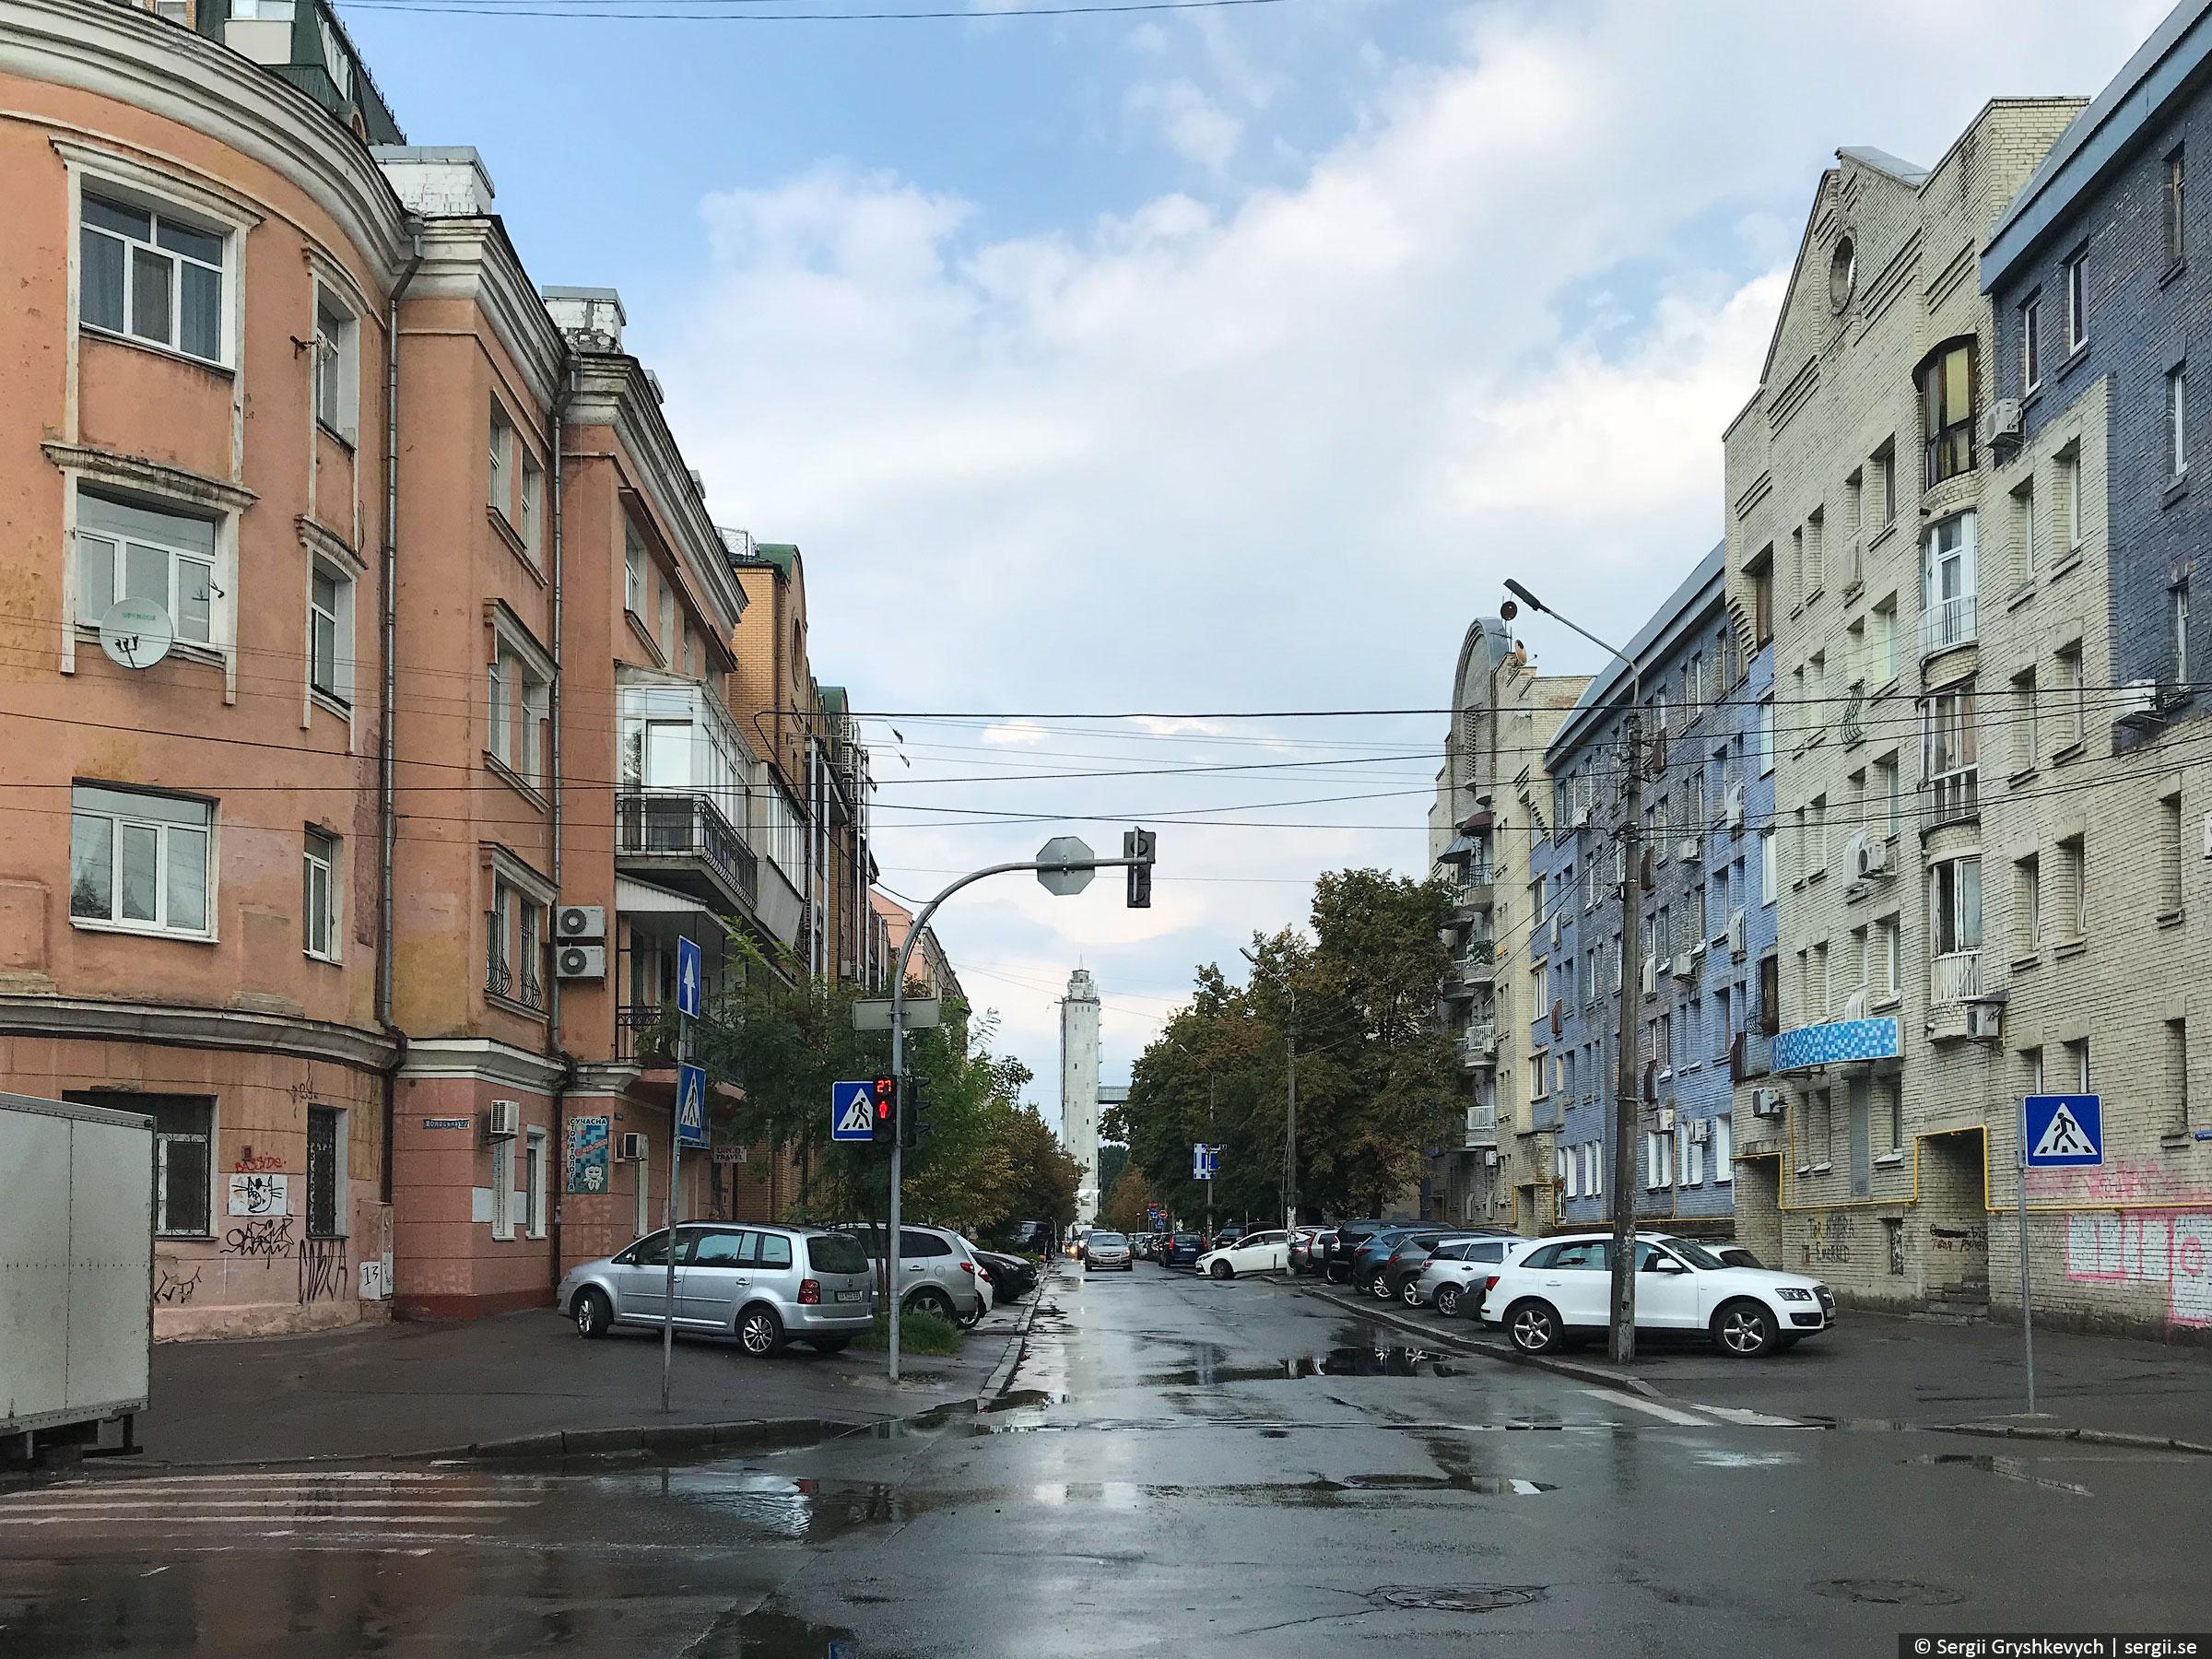 kyiv-ukraine-2018-128